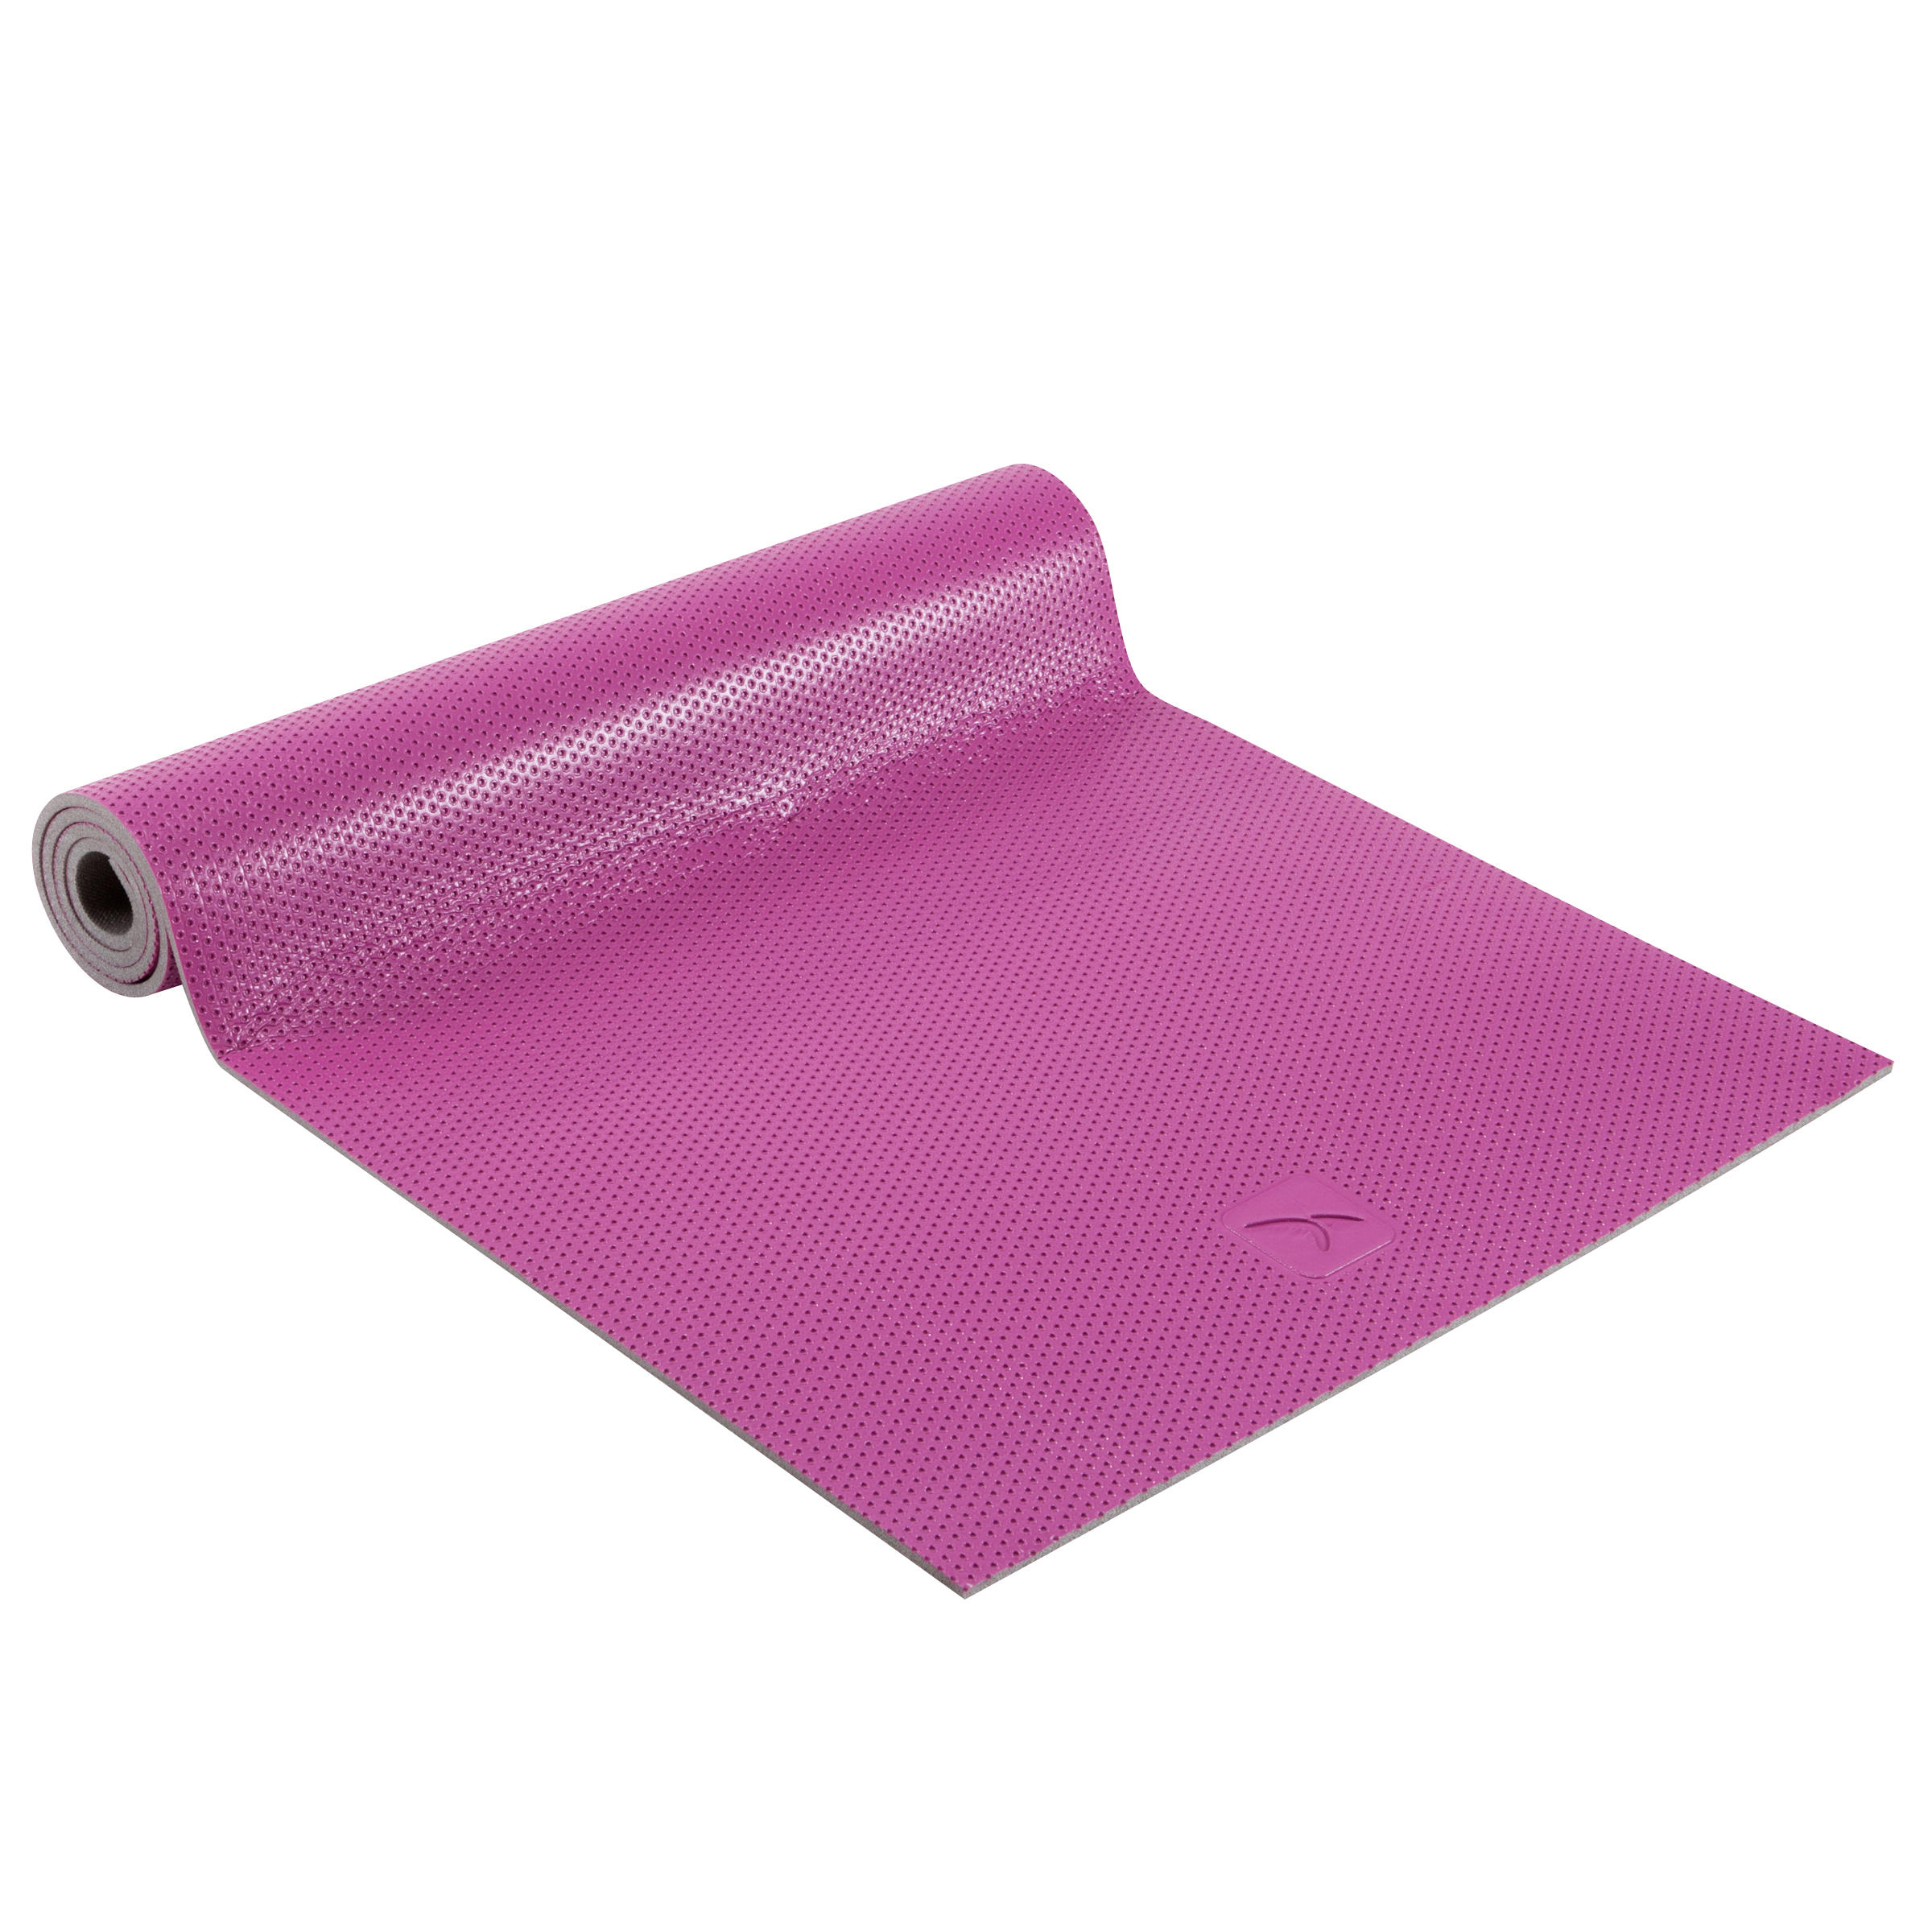 Tapete de gimnasia y pilates 500 rosa 160 x 60 cm